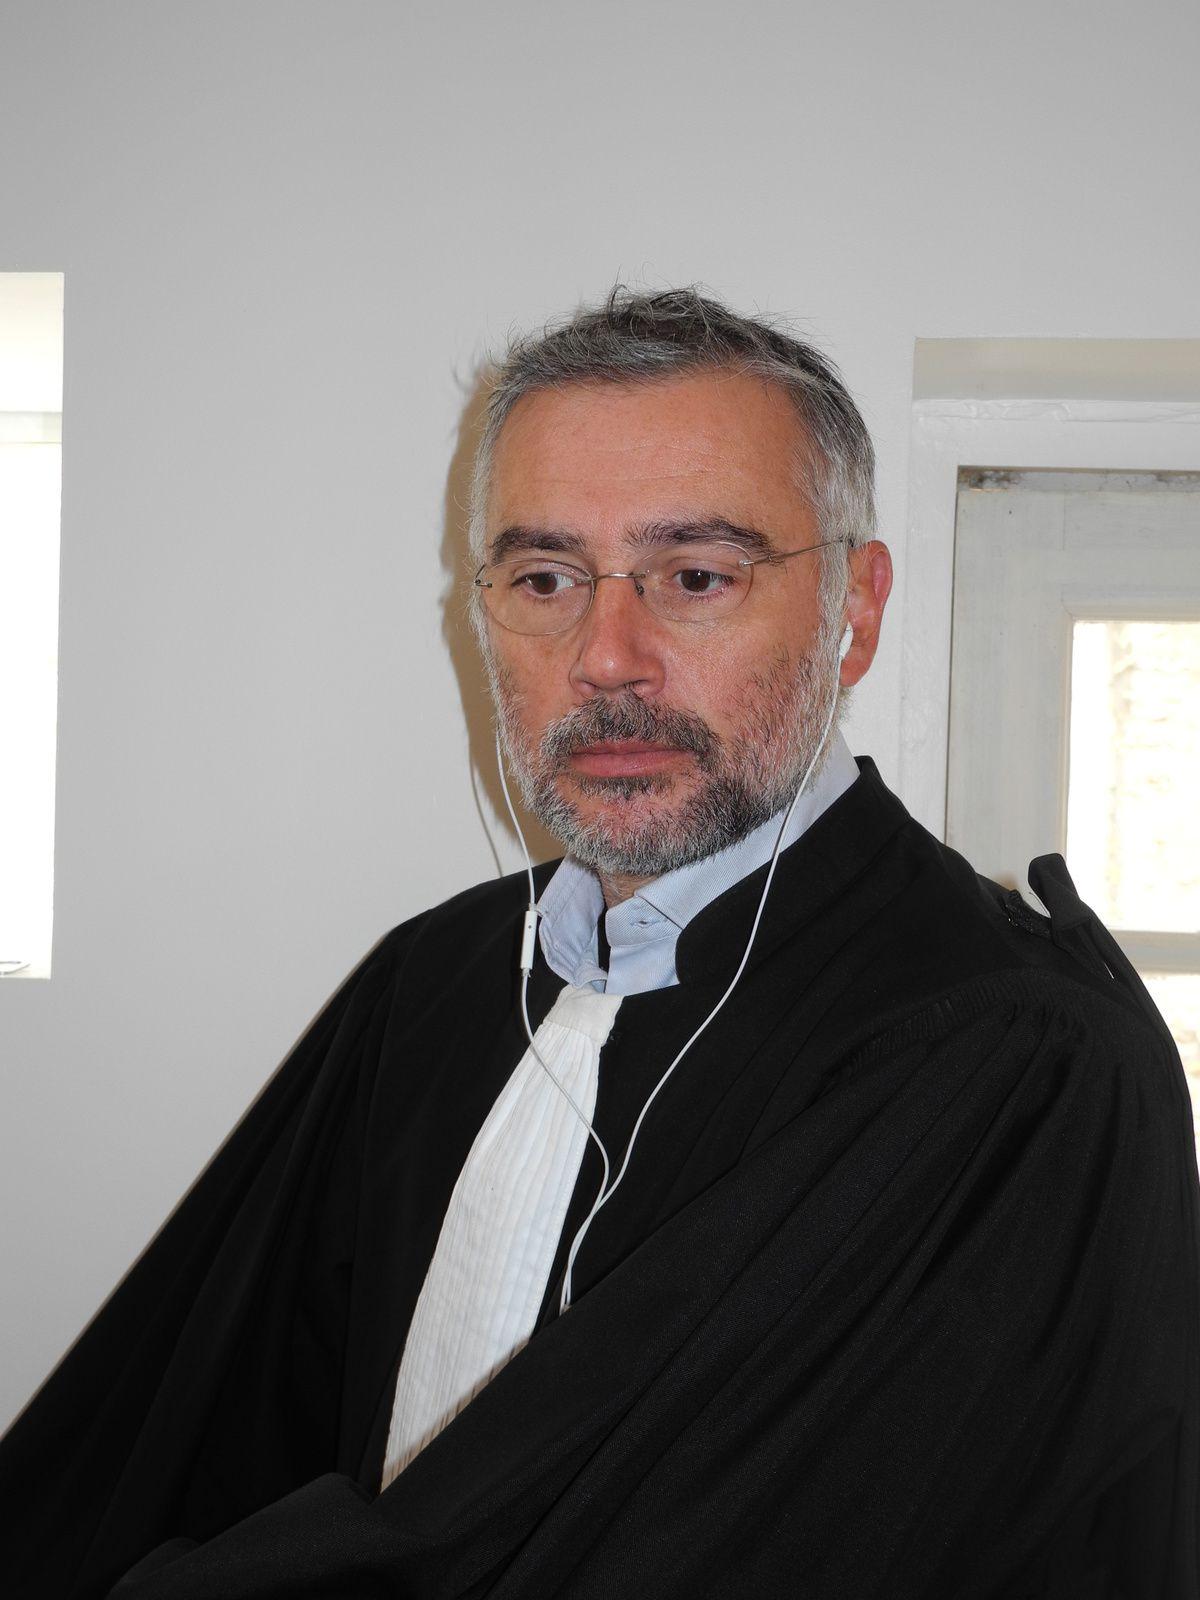 avocate saint brieuc